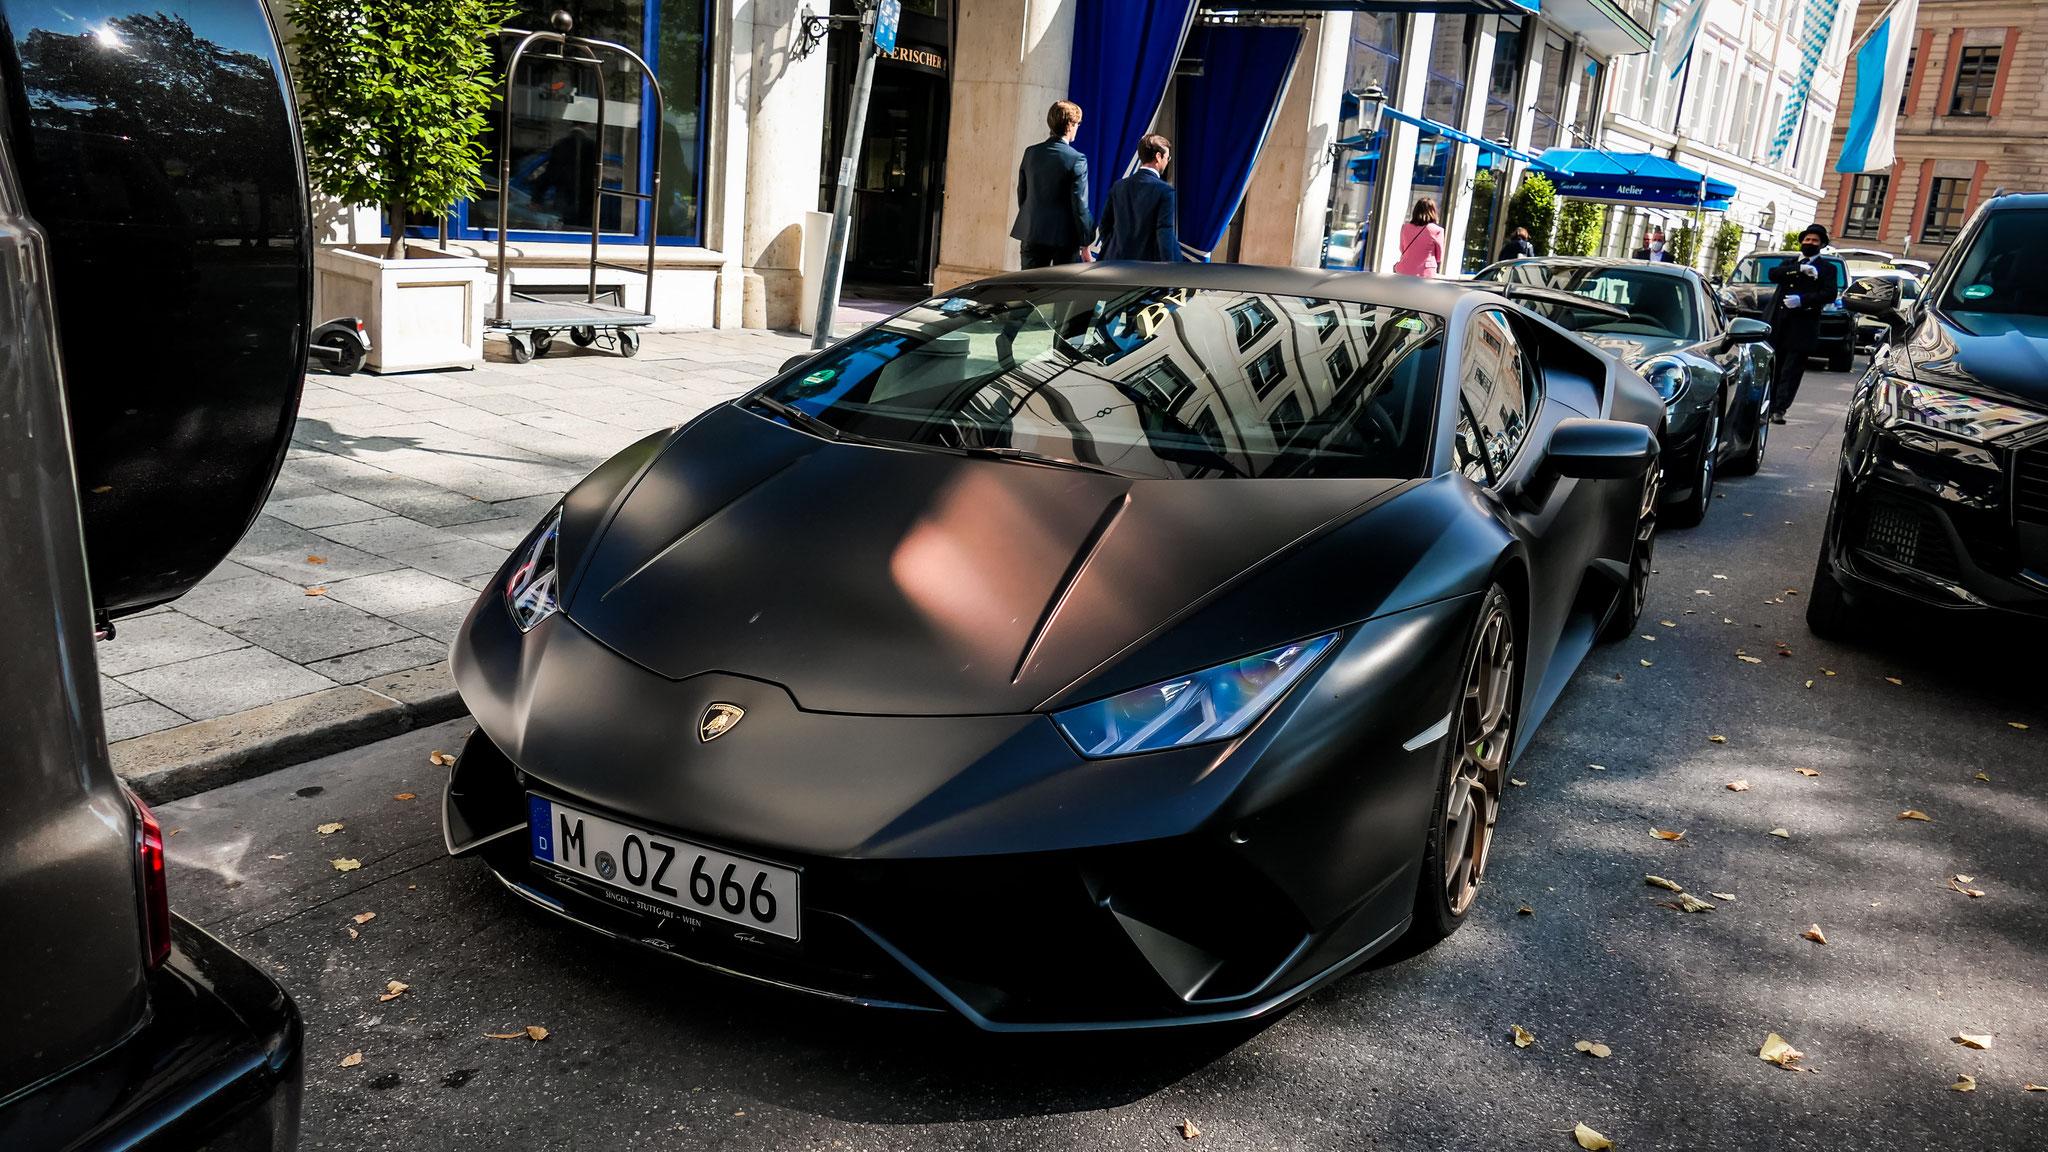 Lamborghini Huracan Performante - M-OZ-666